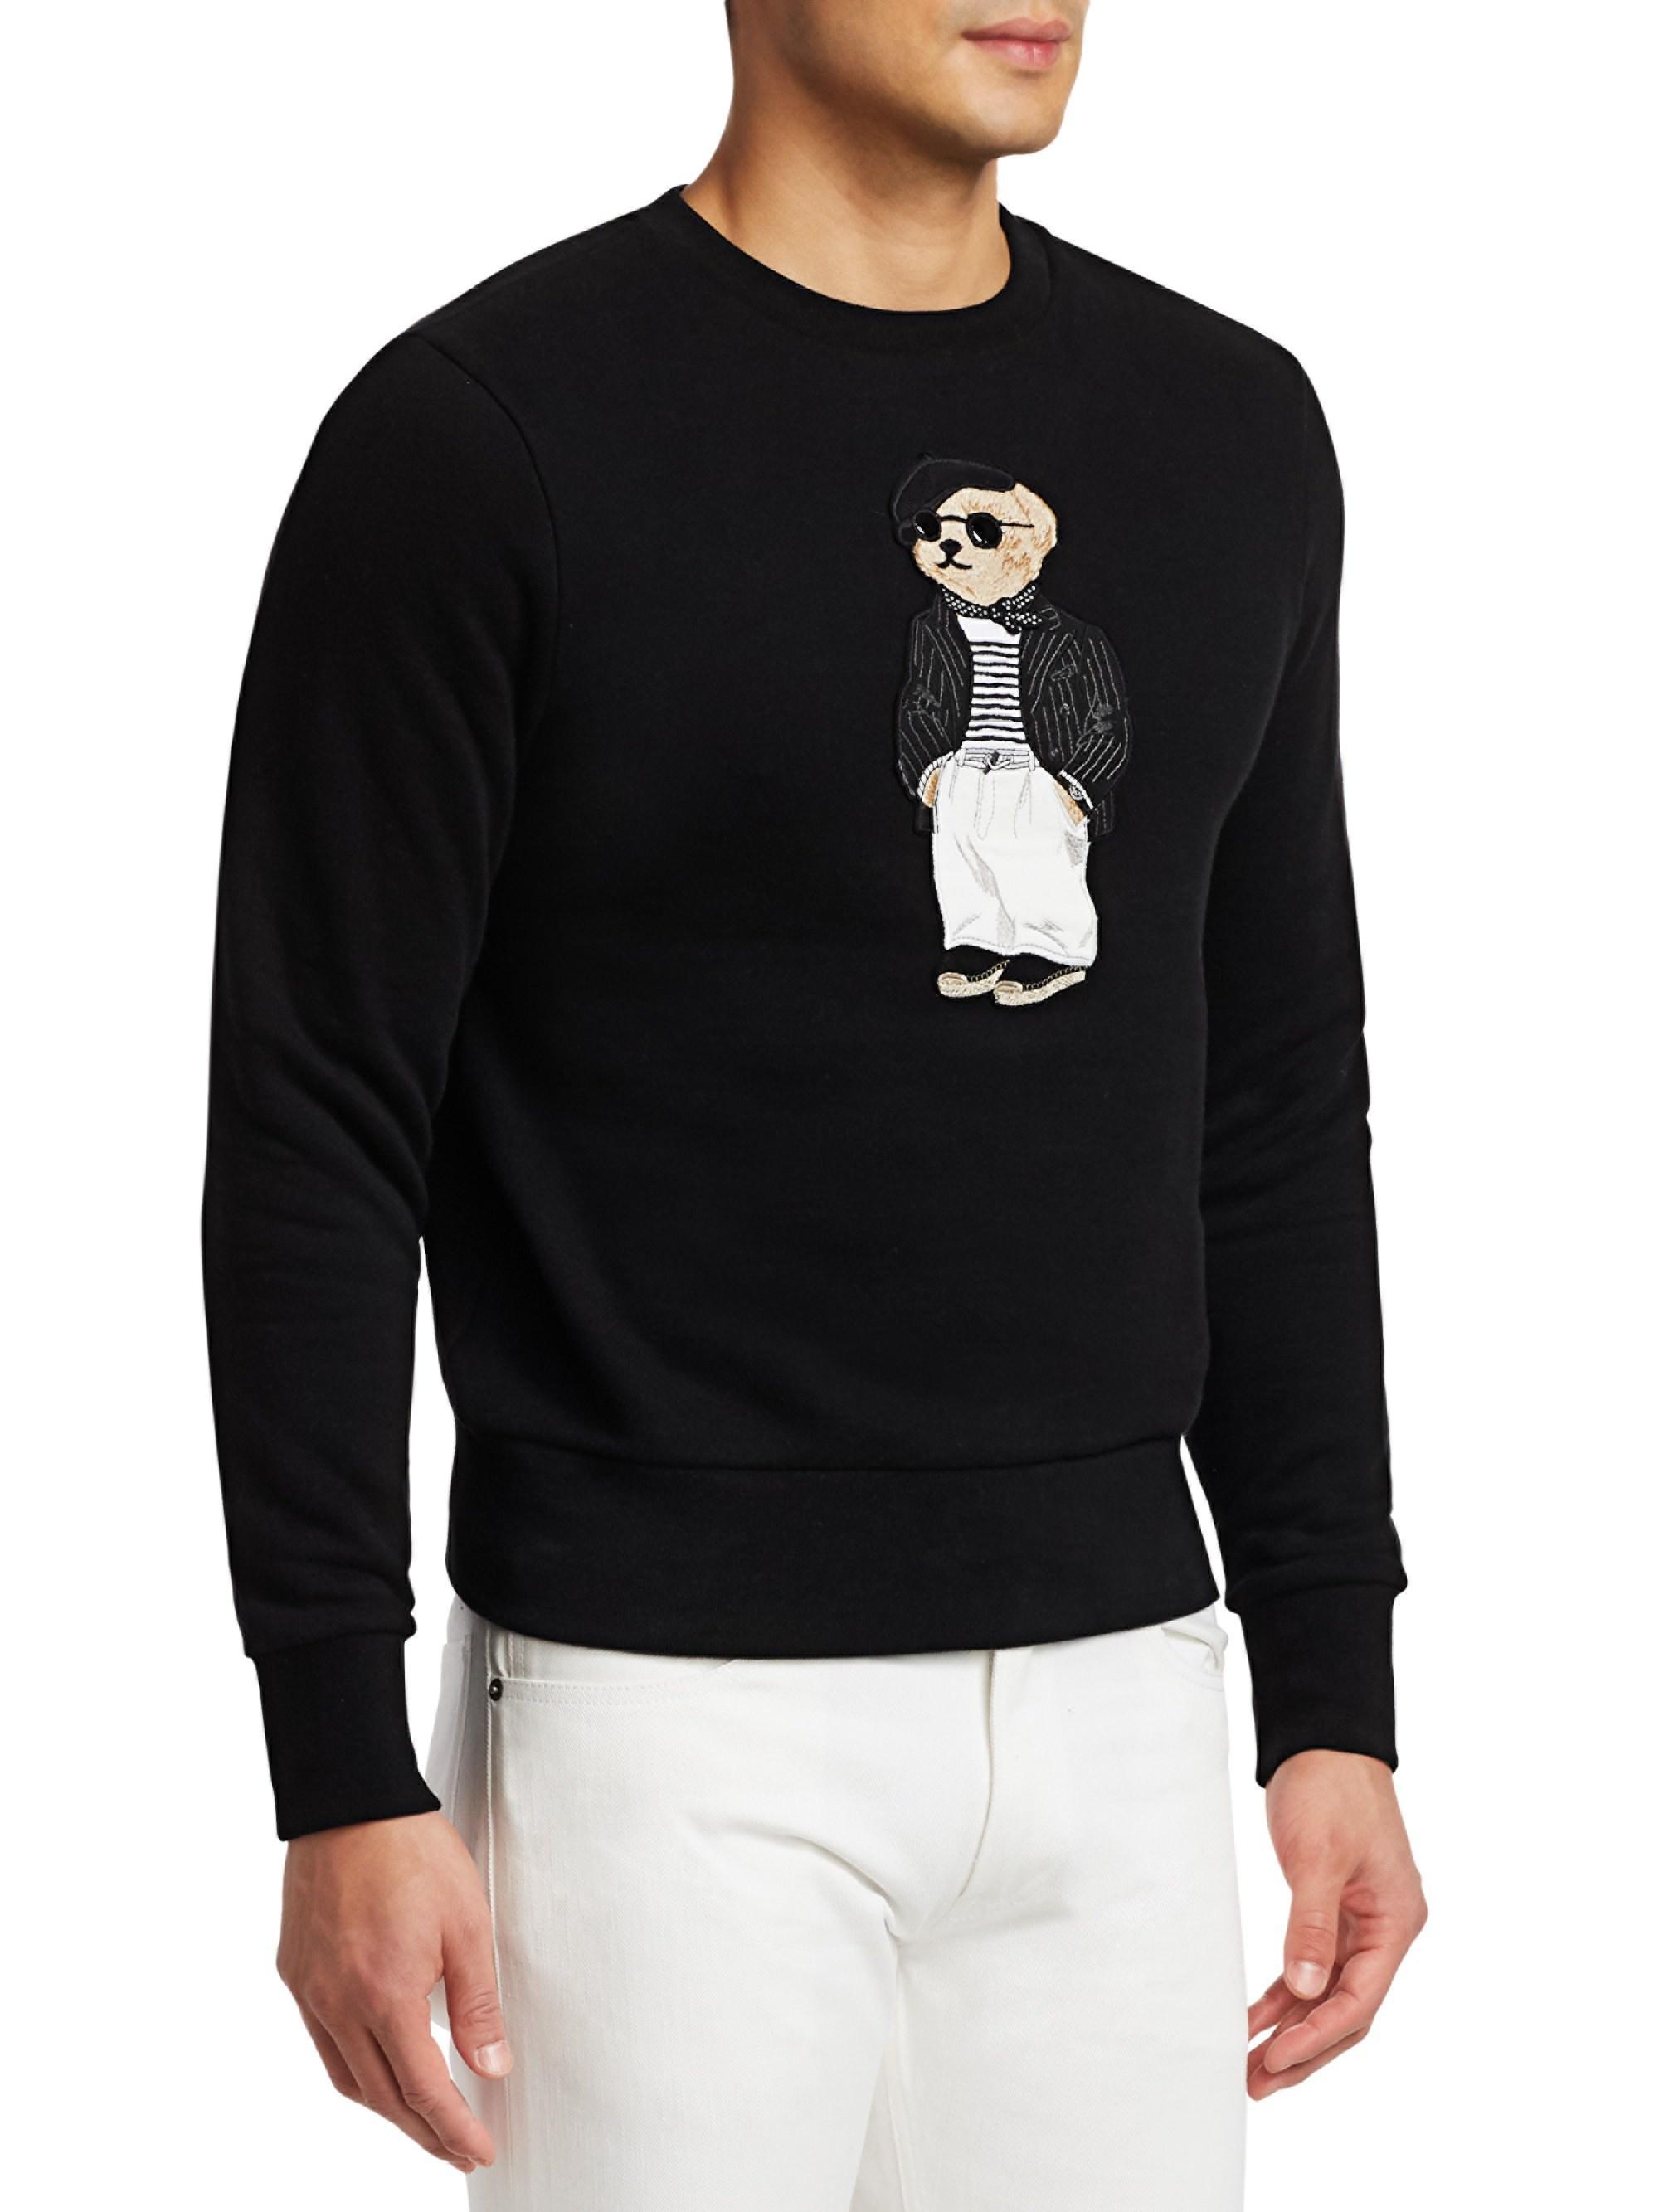 Ralph Lauren Purple Label - Black Lux Fleece Bear Sweatshirt for Men -  Lyst. View fullscreen 99bf7bdb4ba0a